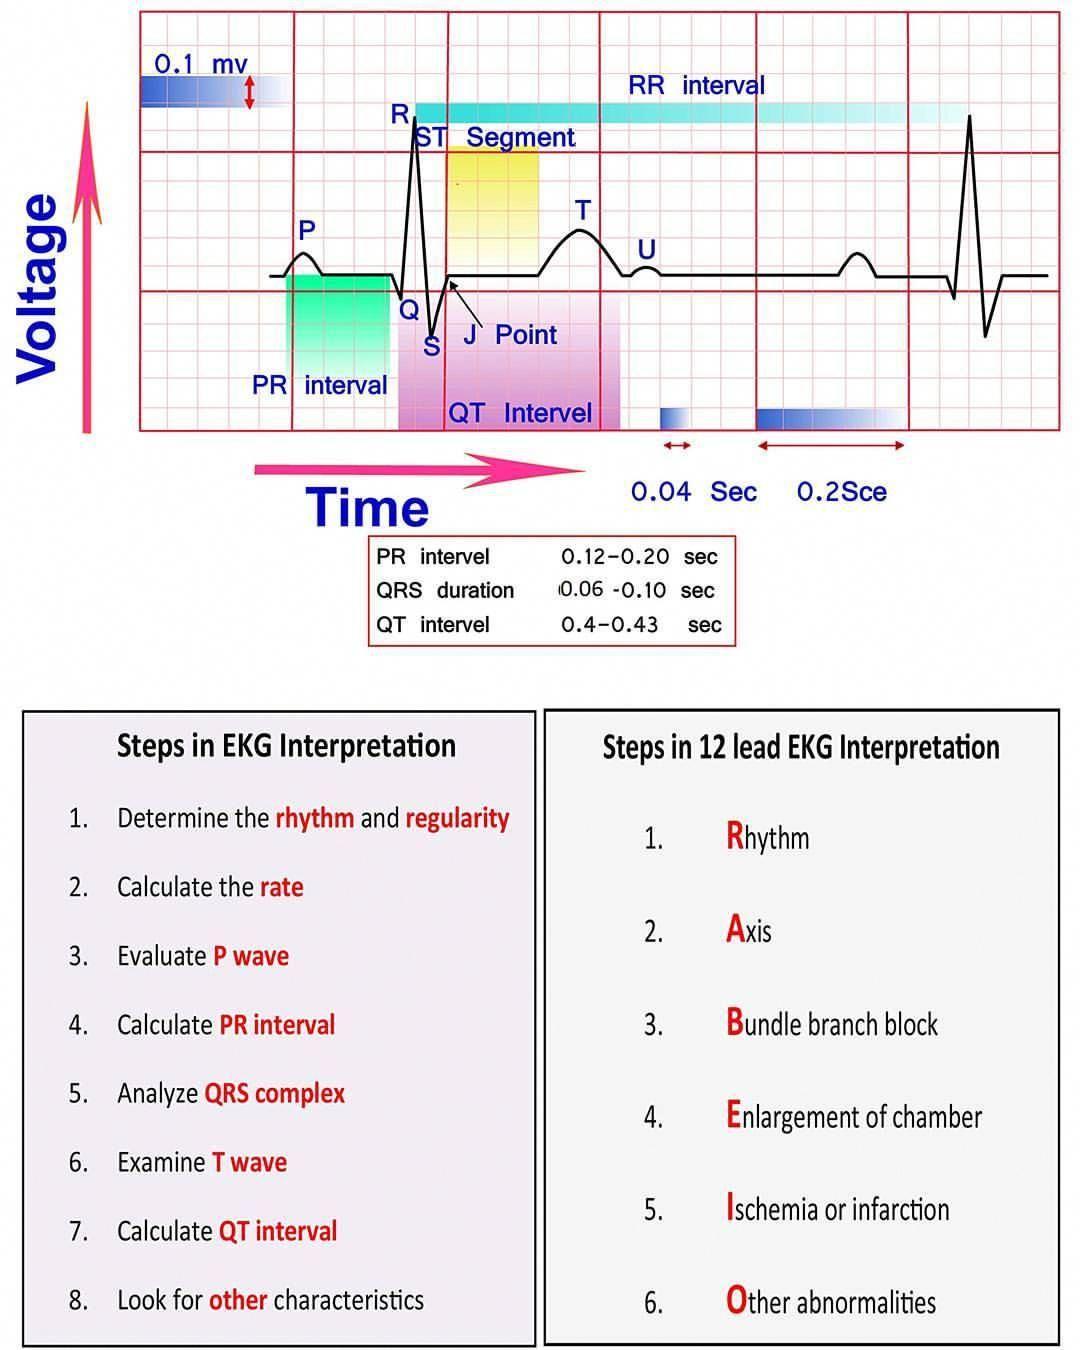 lpn classes near me nursingschools Cardiac nursing